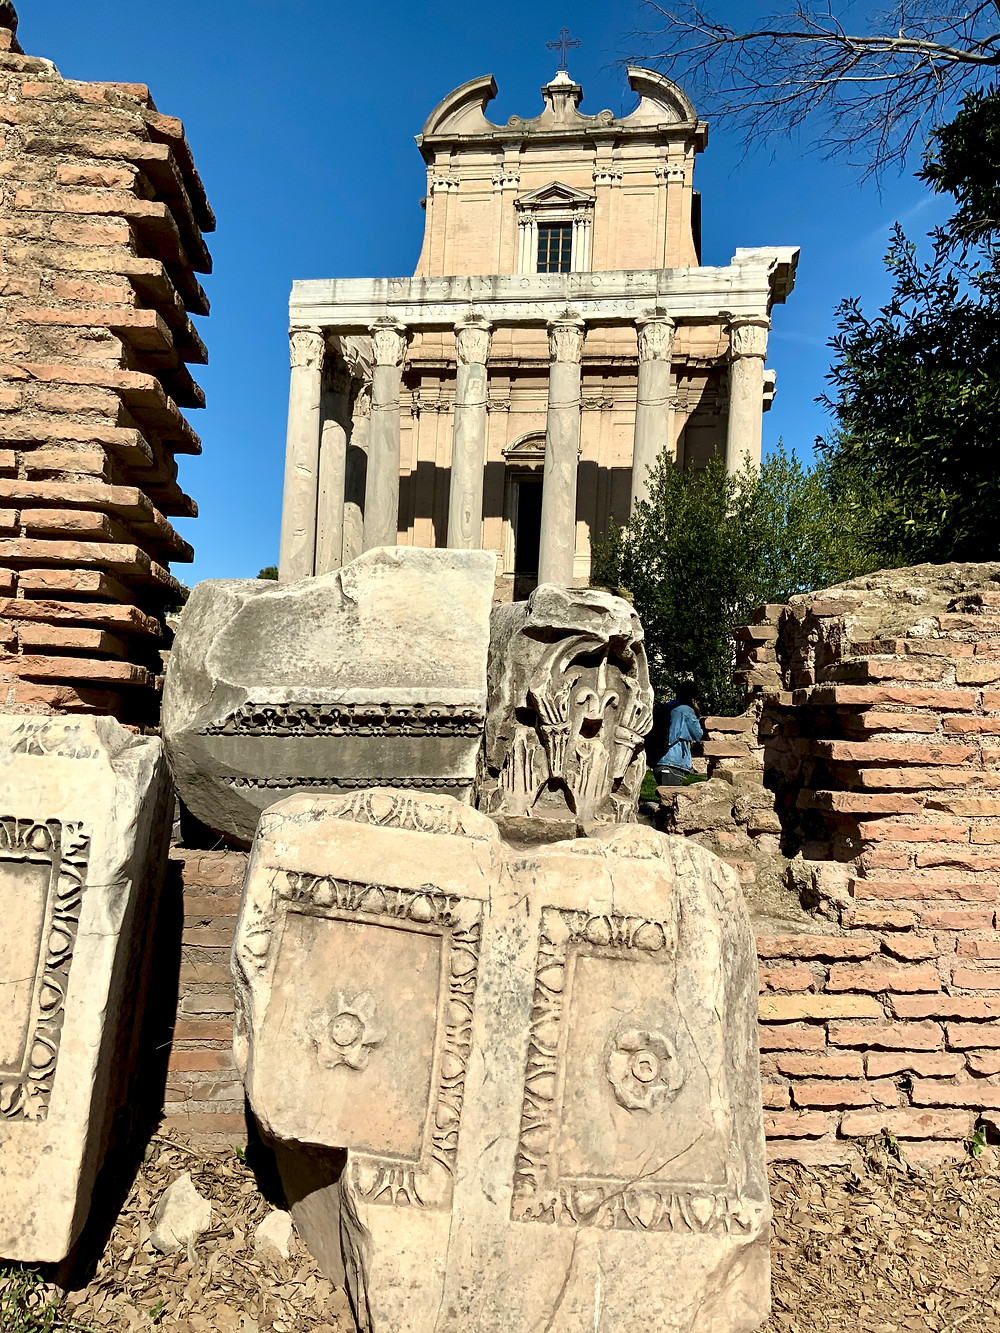 Temple of Antonius and Faustia